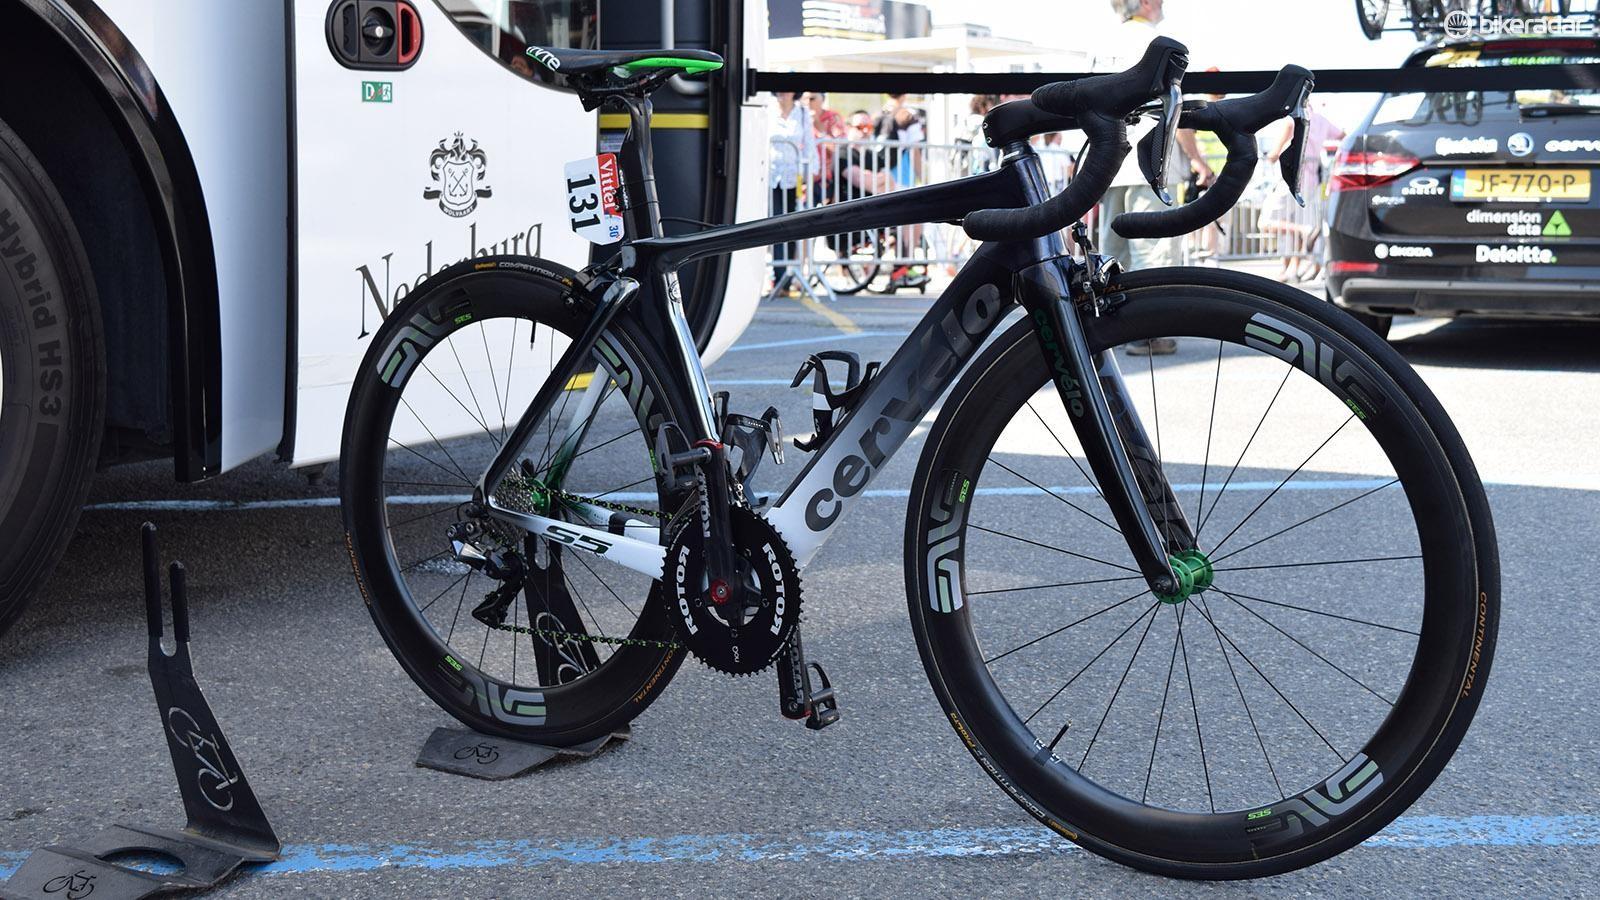 Mark Cavendish's custom-painted Cervelo S5